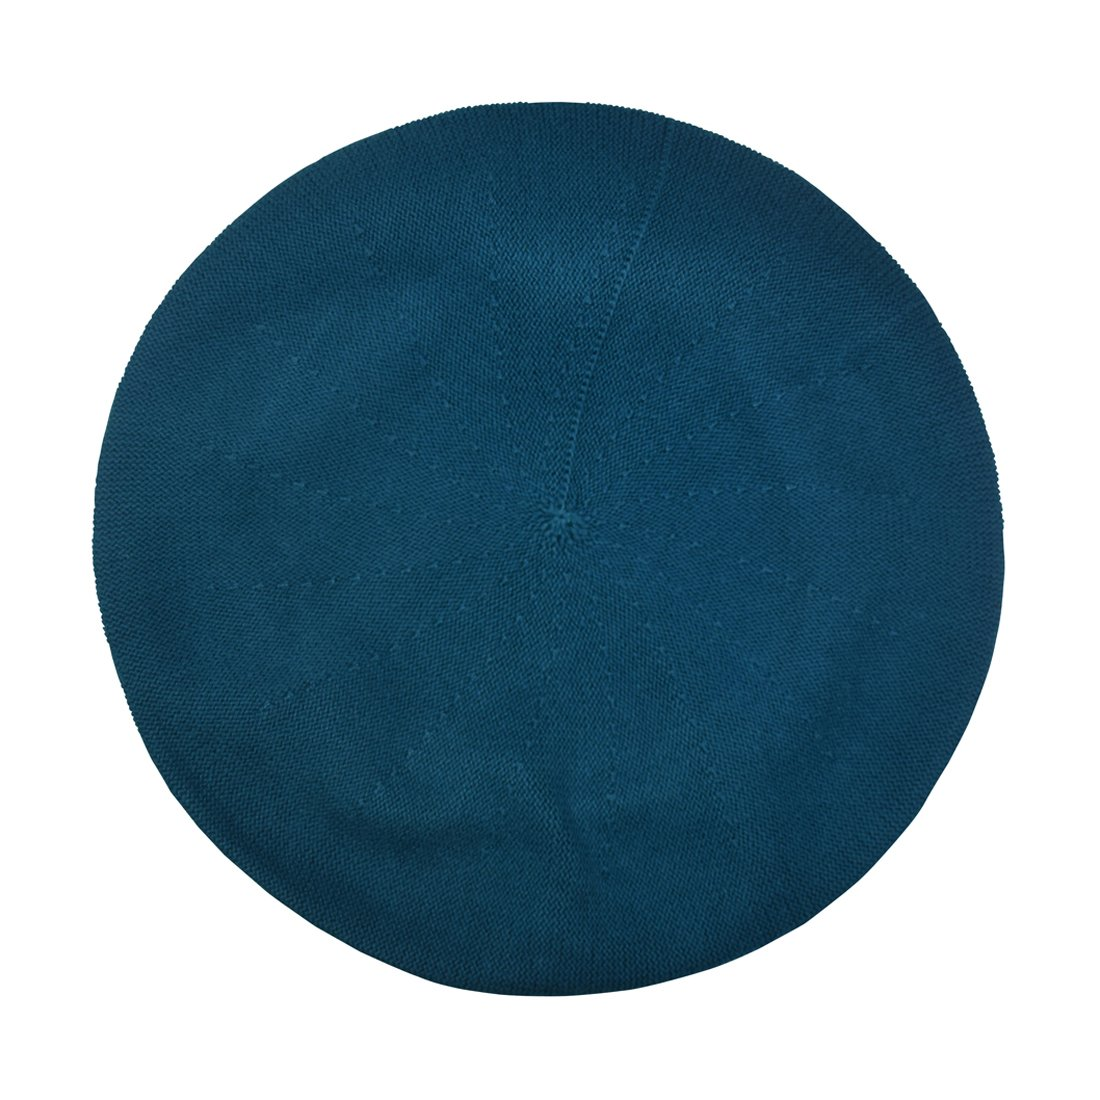 Landana Headscarves Turquoise Beret for Women 100% Cotton Solid - Medium/Large